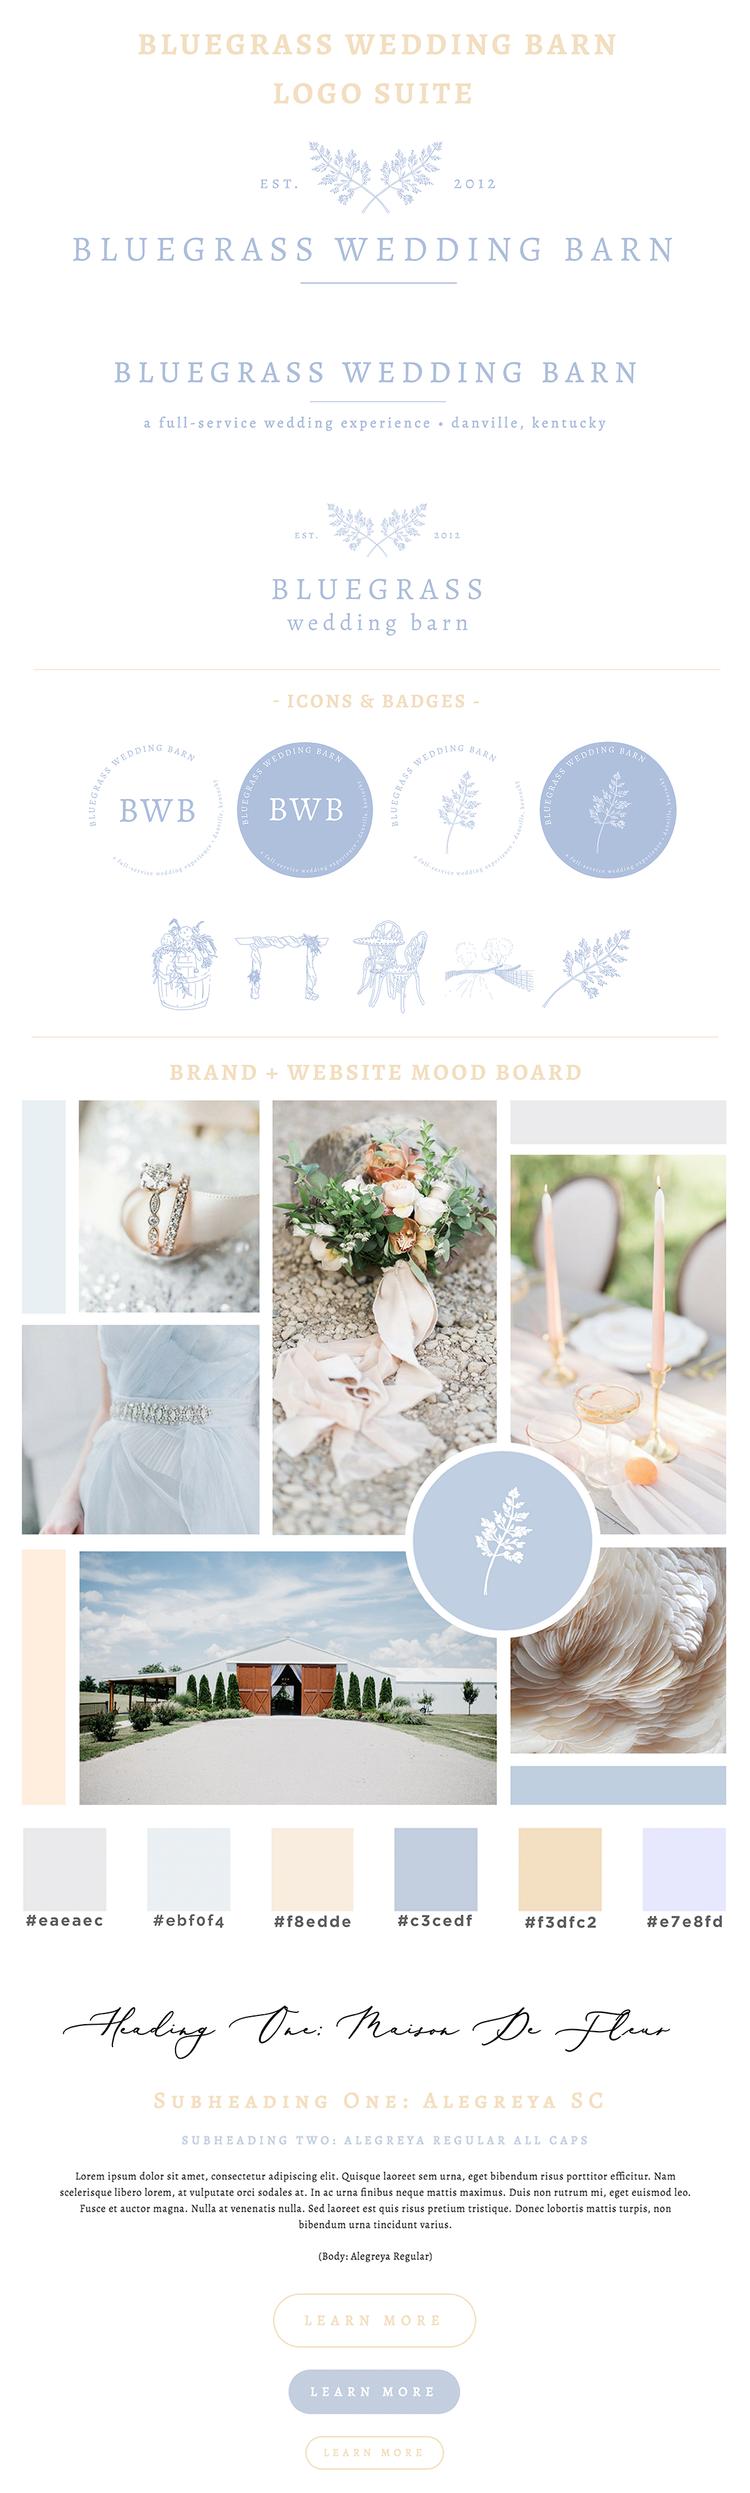 bwb-wedding-venue-brand-board.png